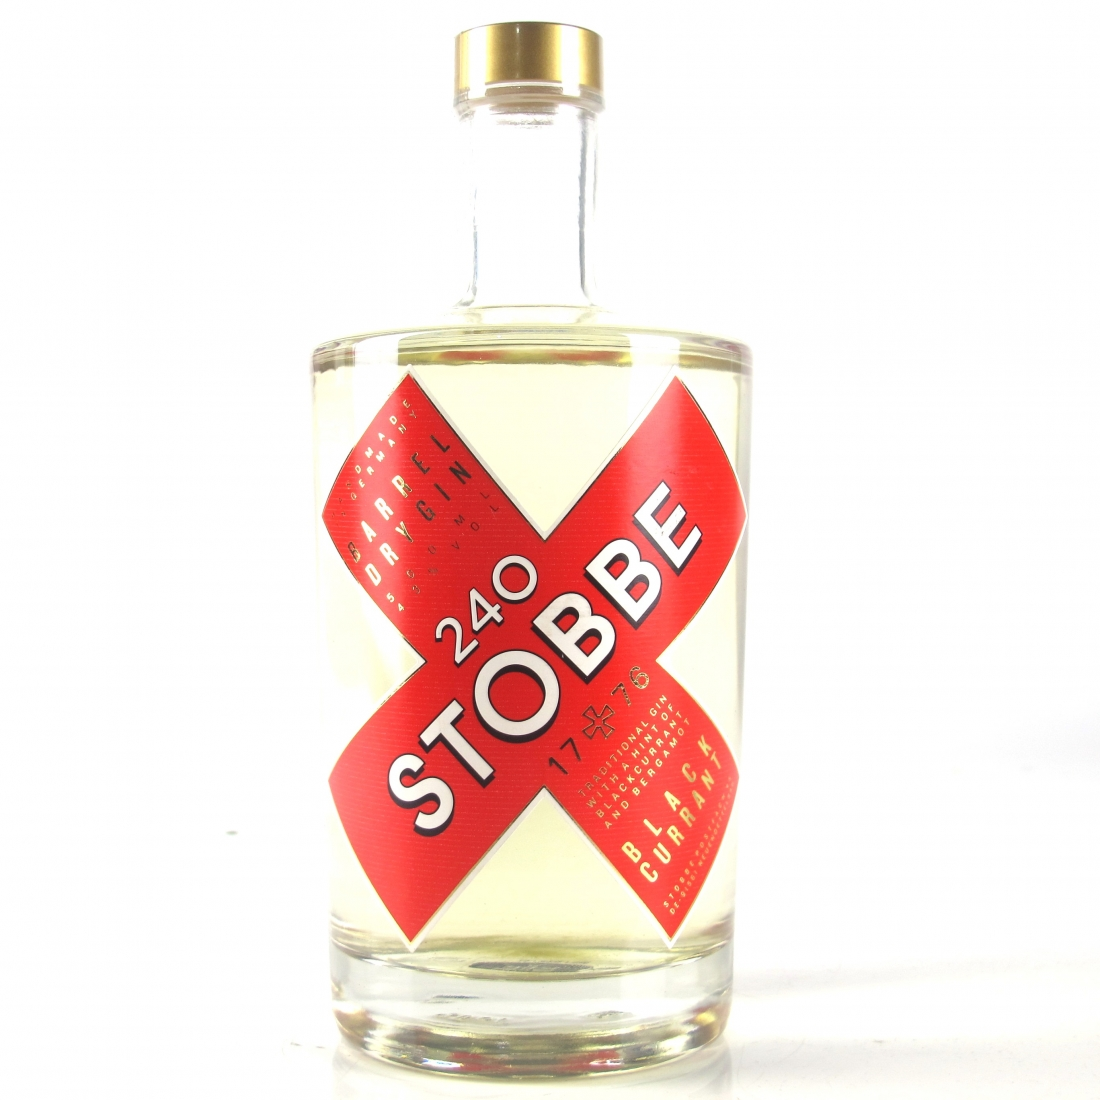 Stobbe 240 Blackcurrant Barrel Dry Gin 50cl